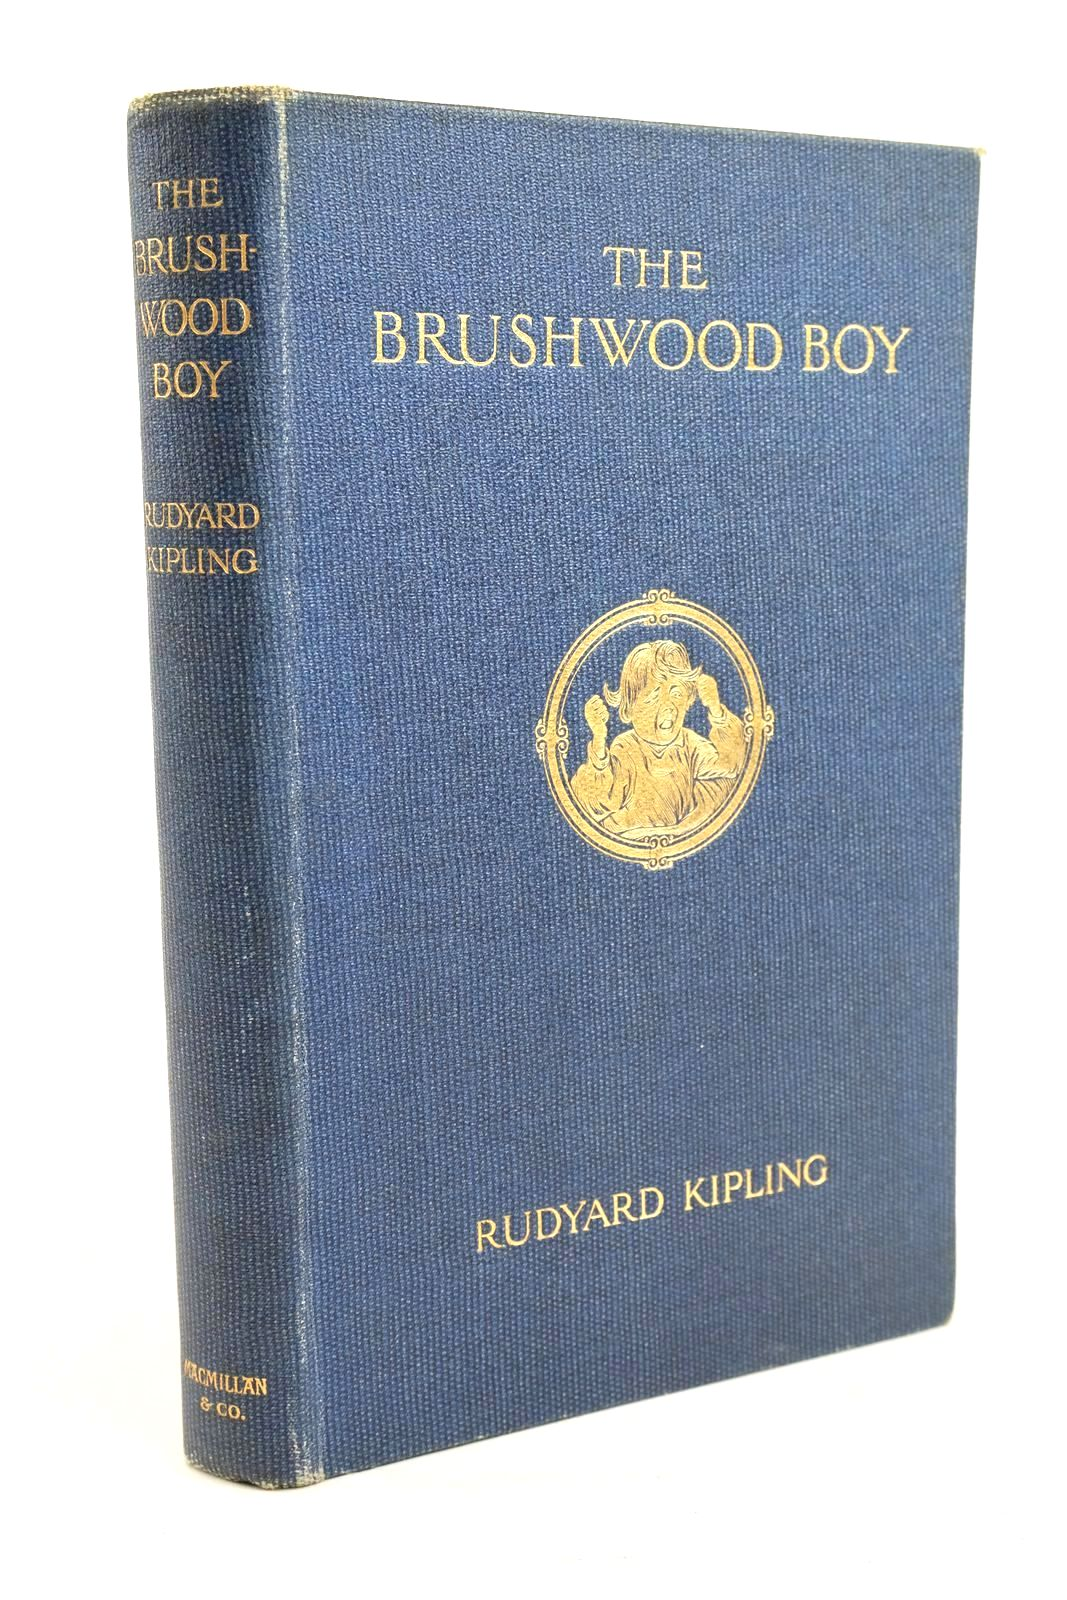 Photo of THE BRUSHWOOD BOY- Stock Number: 1321077